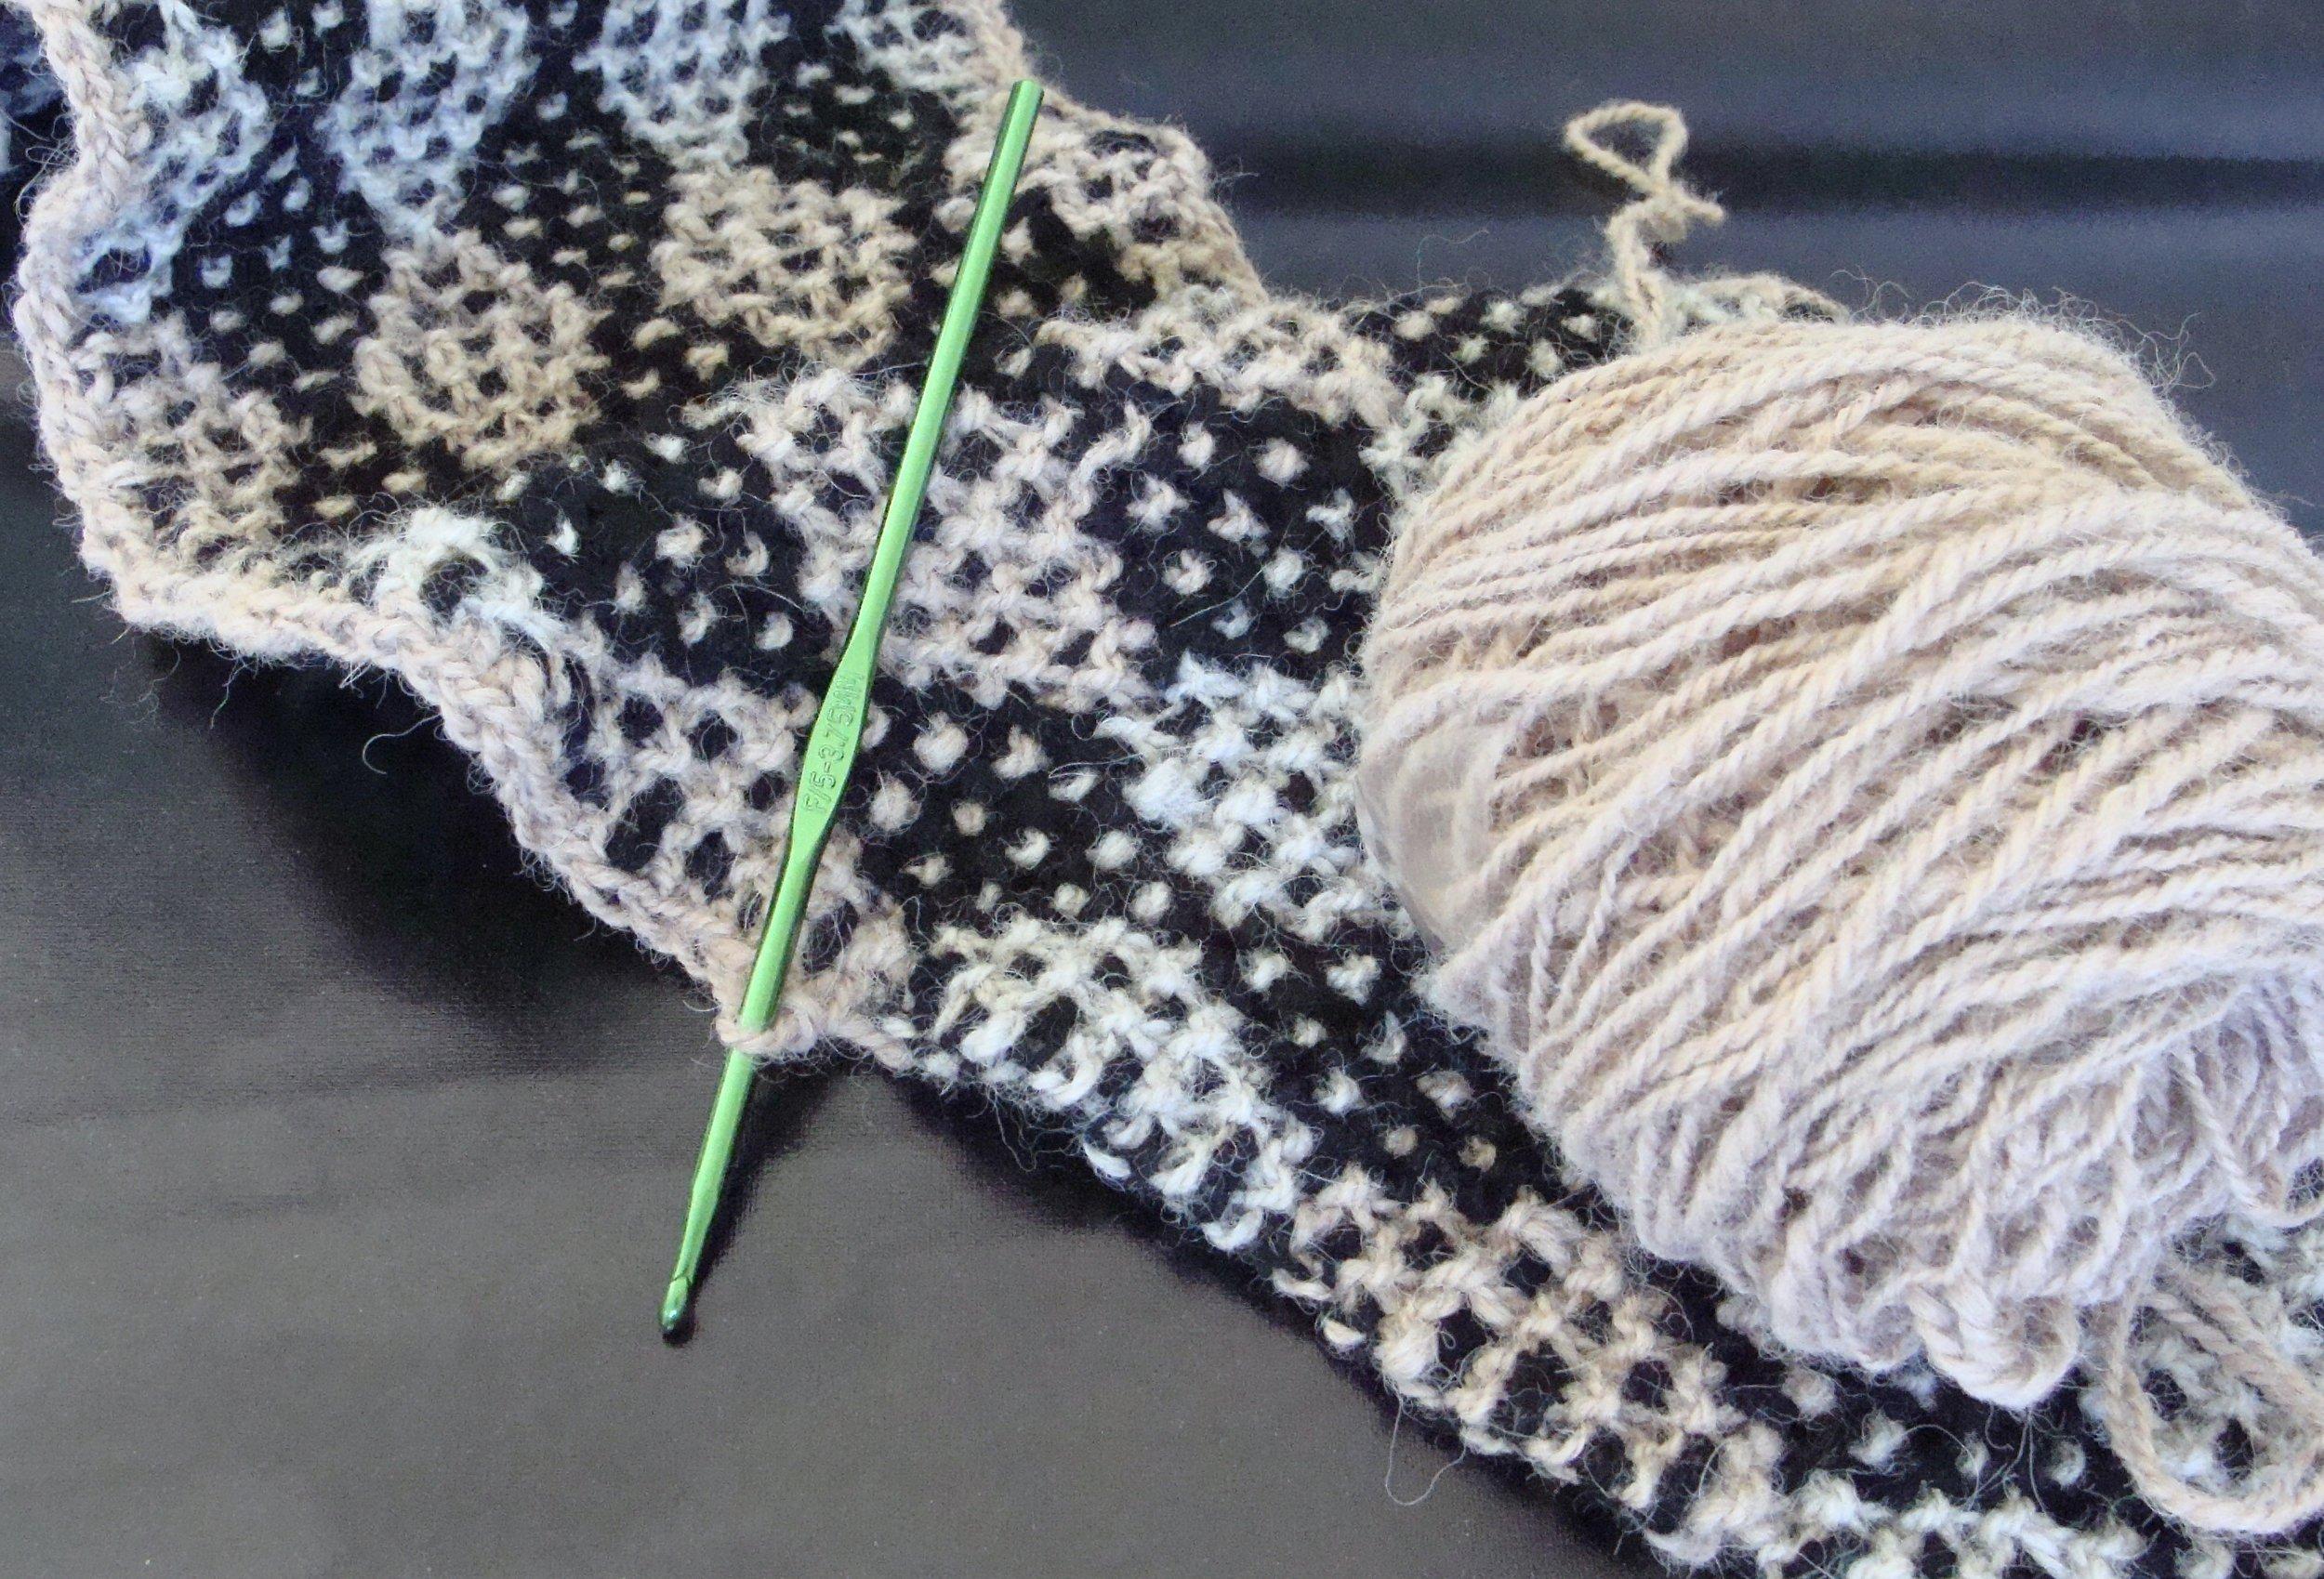 crochet edge on knitted handspun alpaca neck warmer